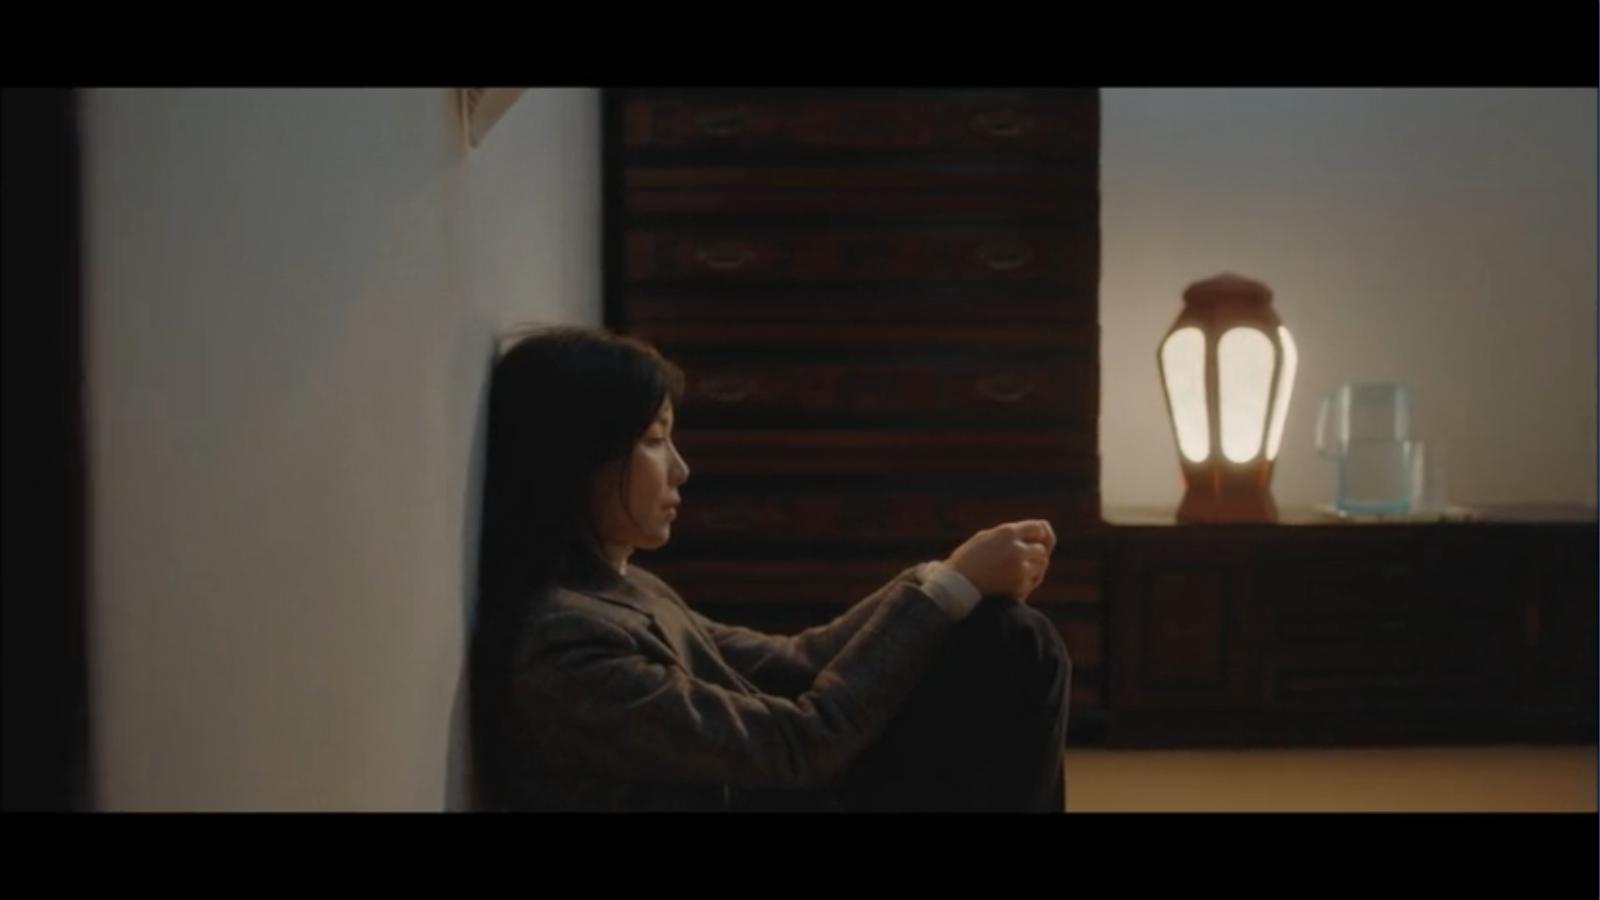 When My Love Blooms Episode 2 Han Jae-hyeon and Yoon Ji-soo sitting in room